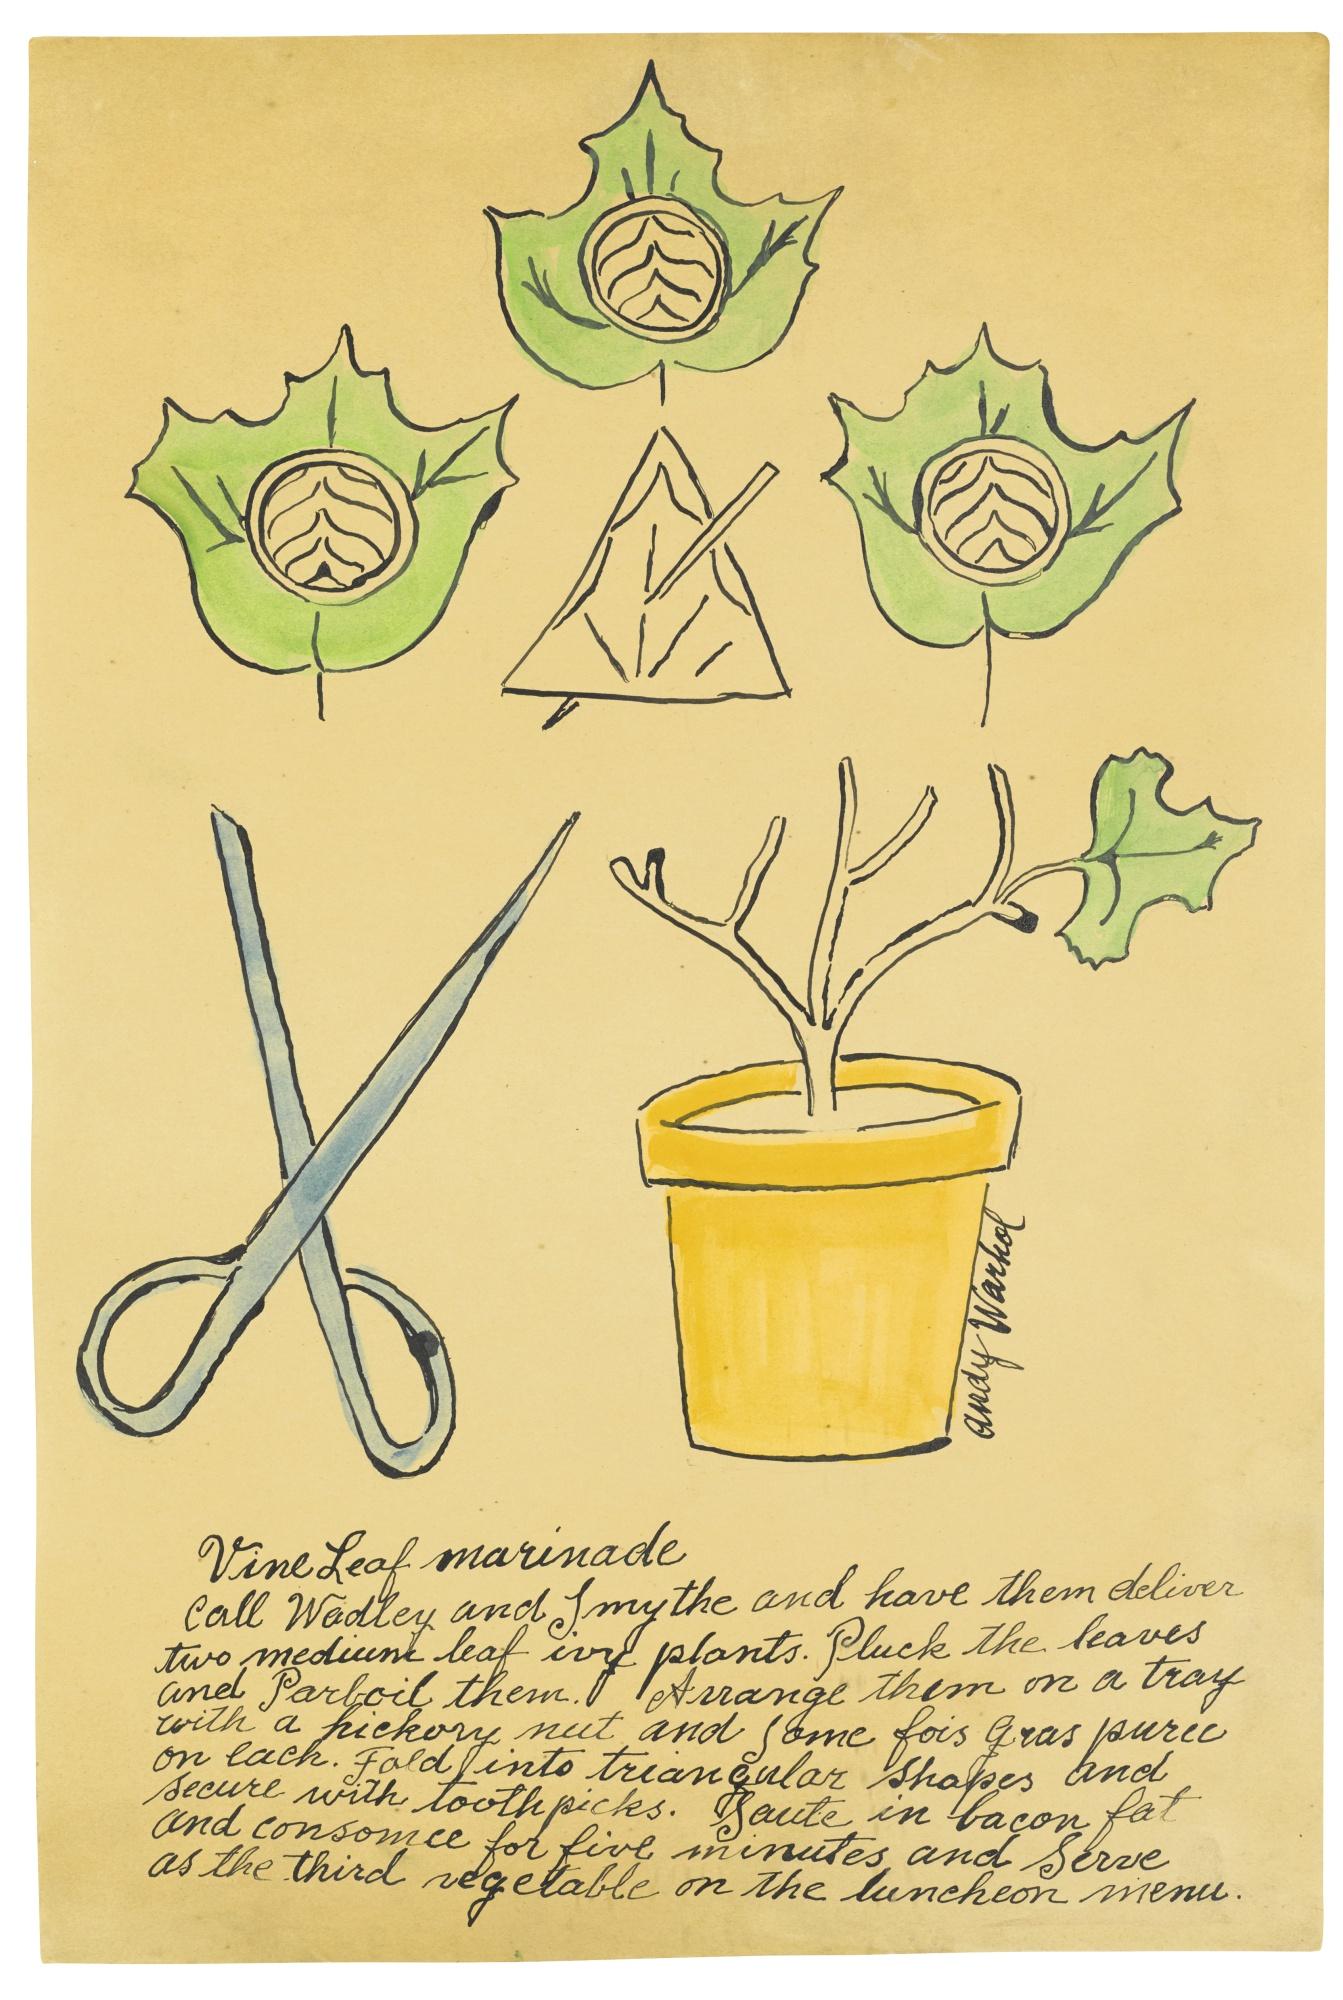 Andy Warhol-Vine Leaf Marinade-1959